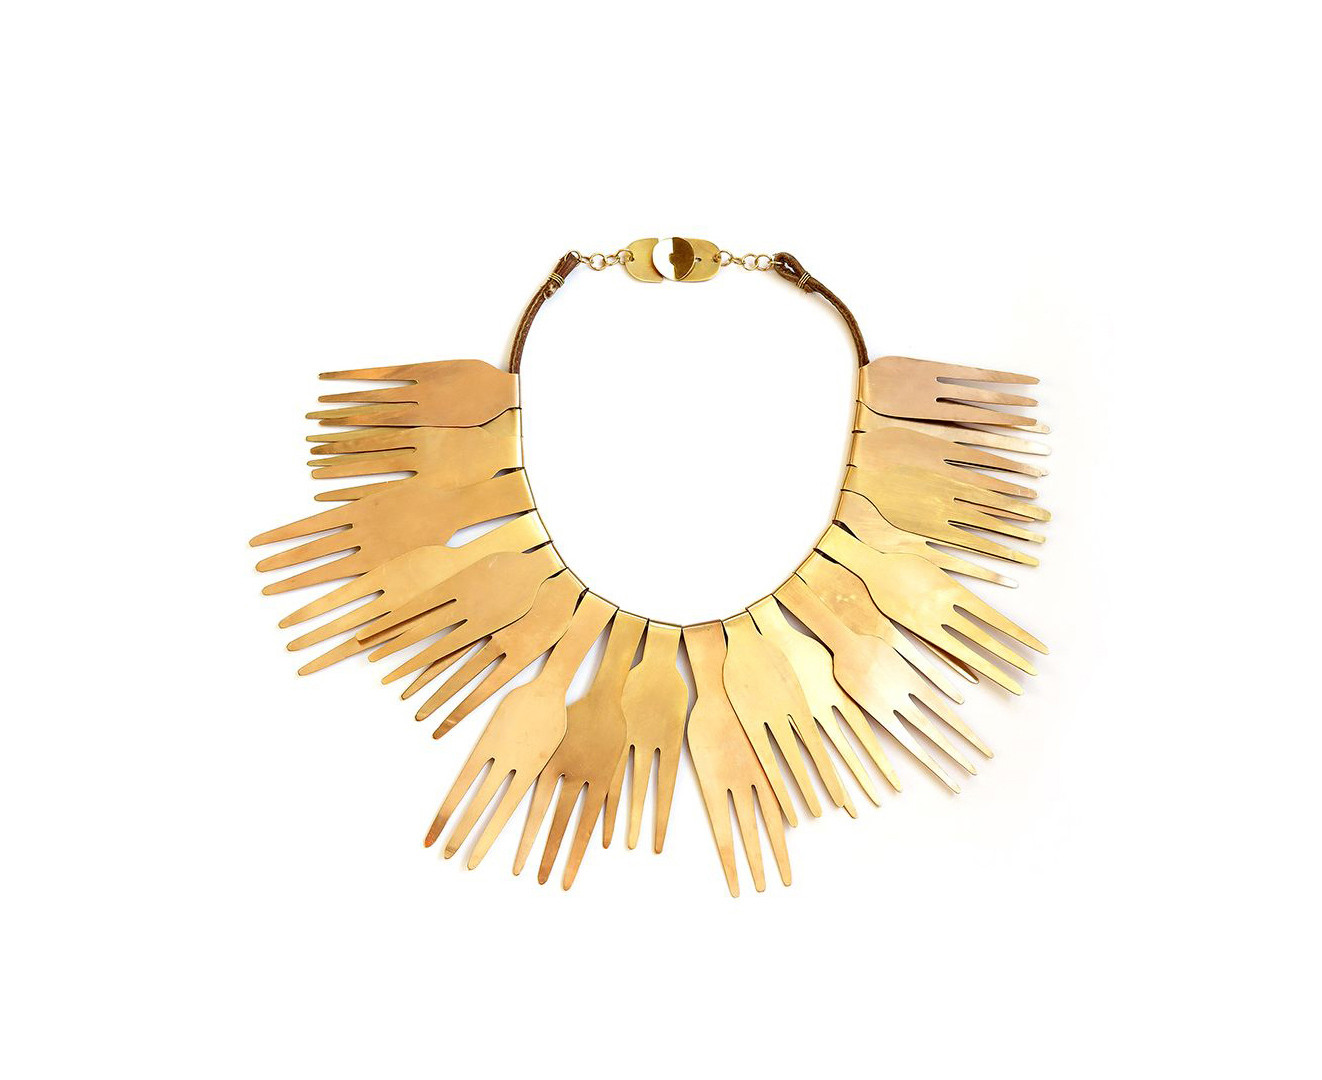 Necklace by Elin Flognman